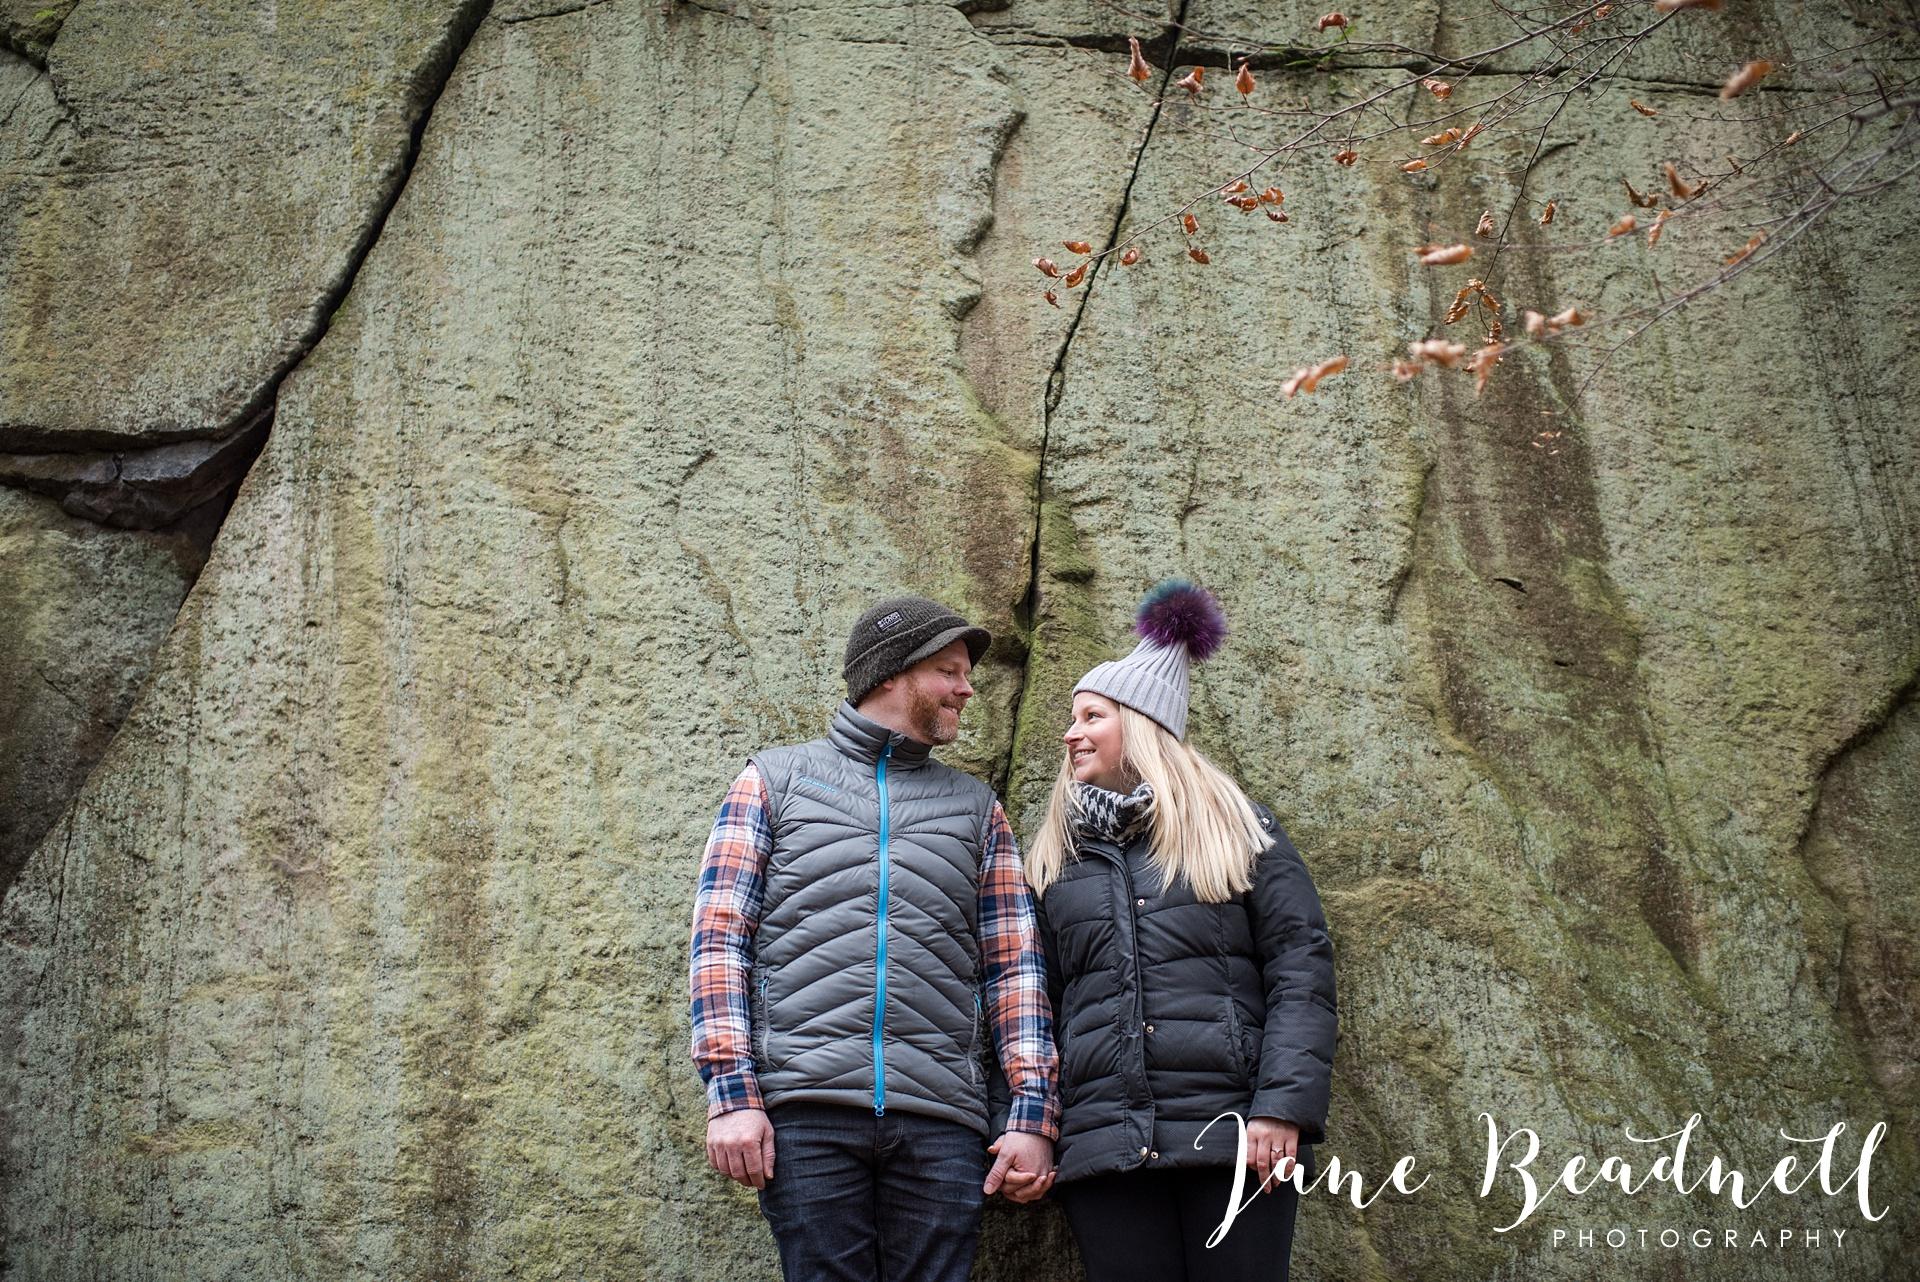 yorkshire-wedding-photographer-jane-beadnell-photography-uk-and-destination-wedding-photographer-engagement-shoot_0055